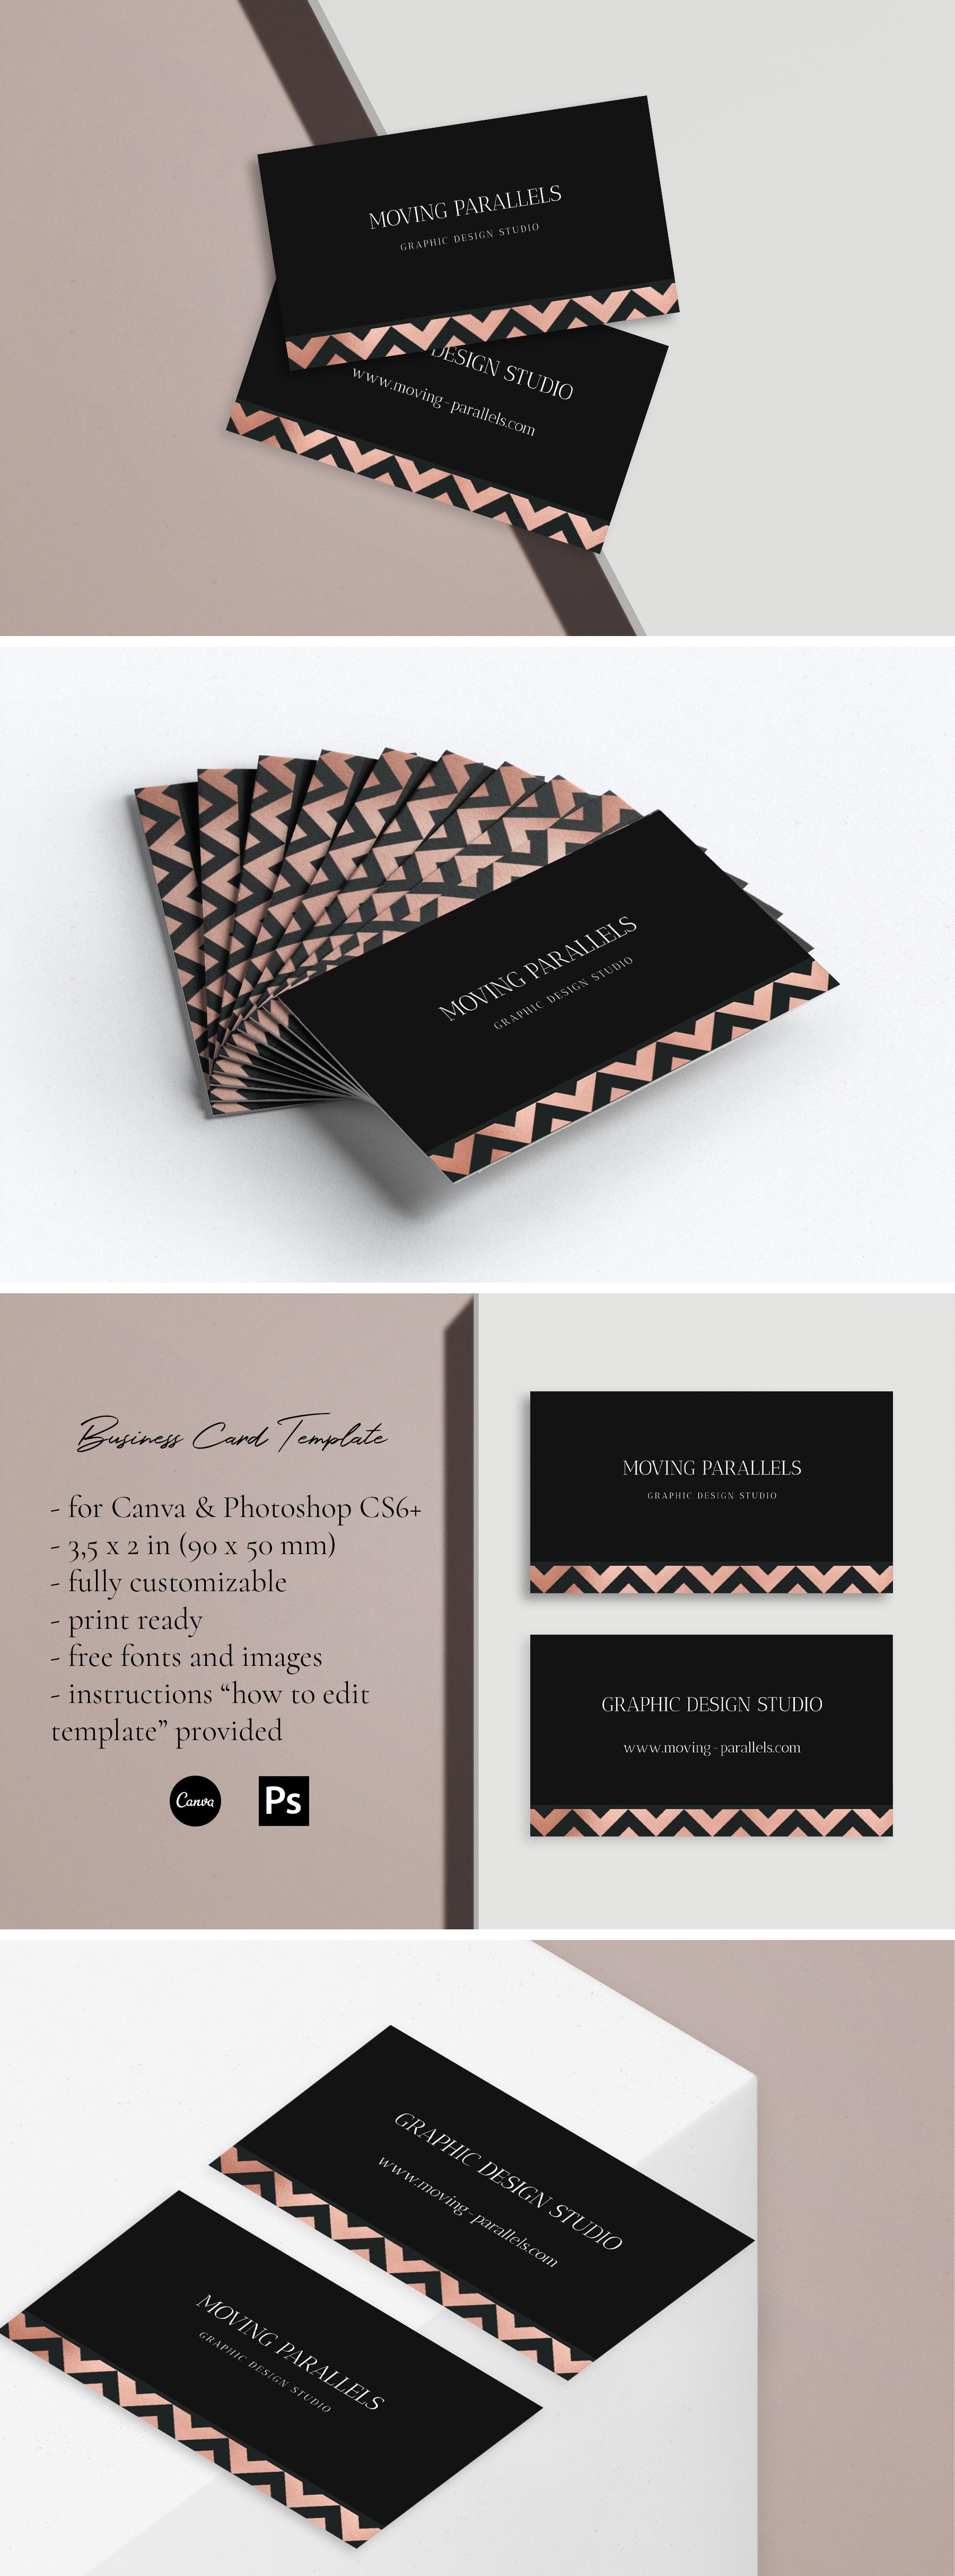 Canva Rose Gold White Black Marble Glitter Foil Business Etsy Foil Business Cards Clever Business Cards Black Business Card